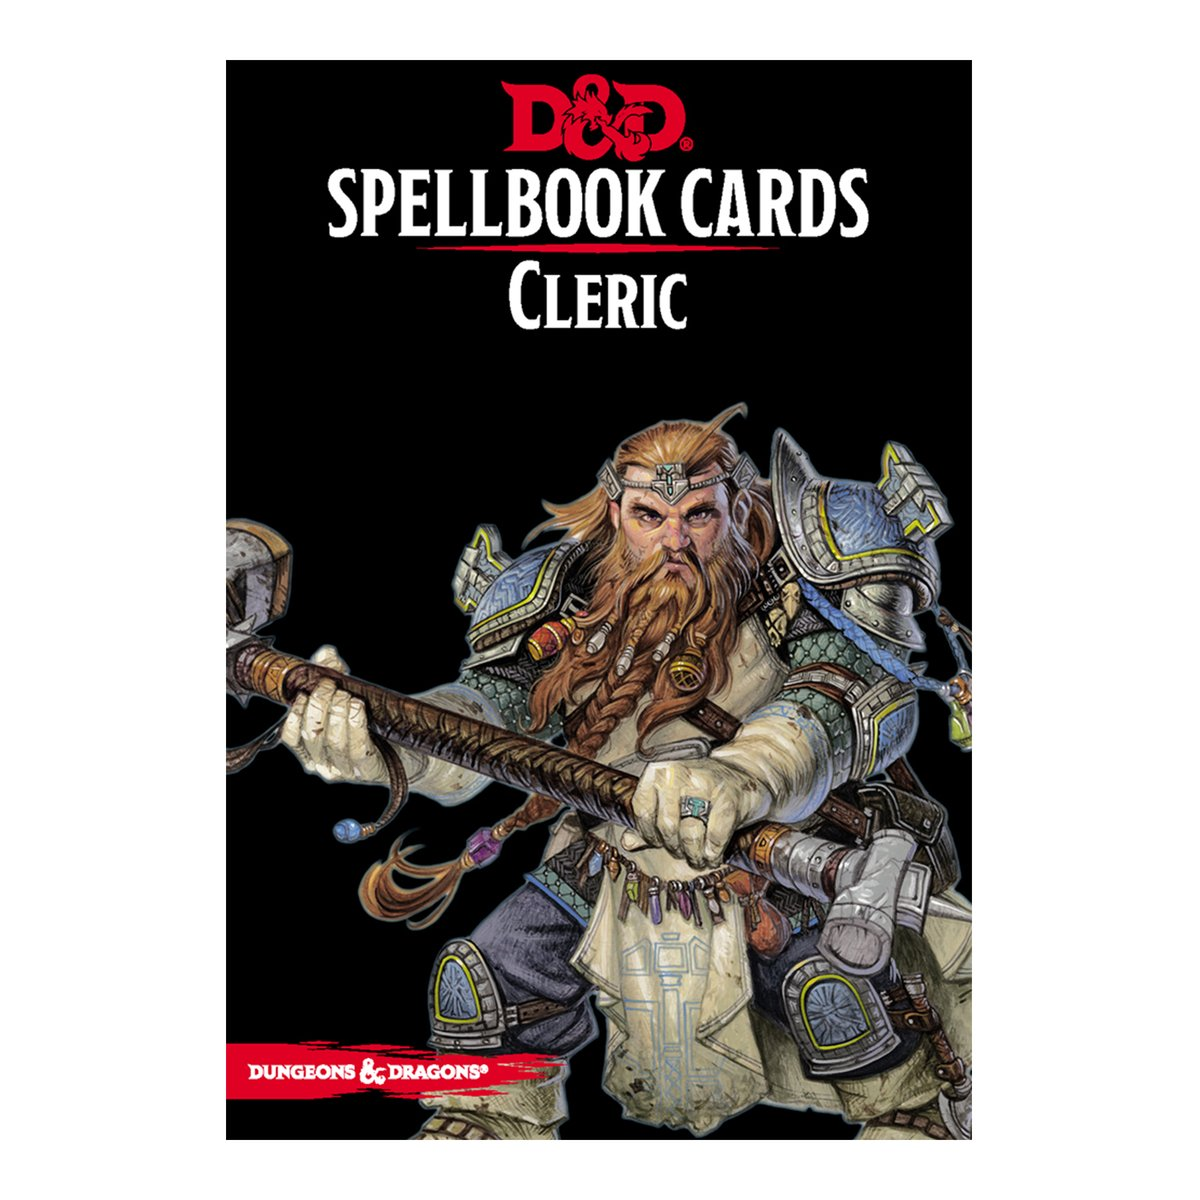 D & D Spellbook Cards - Cleric